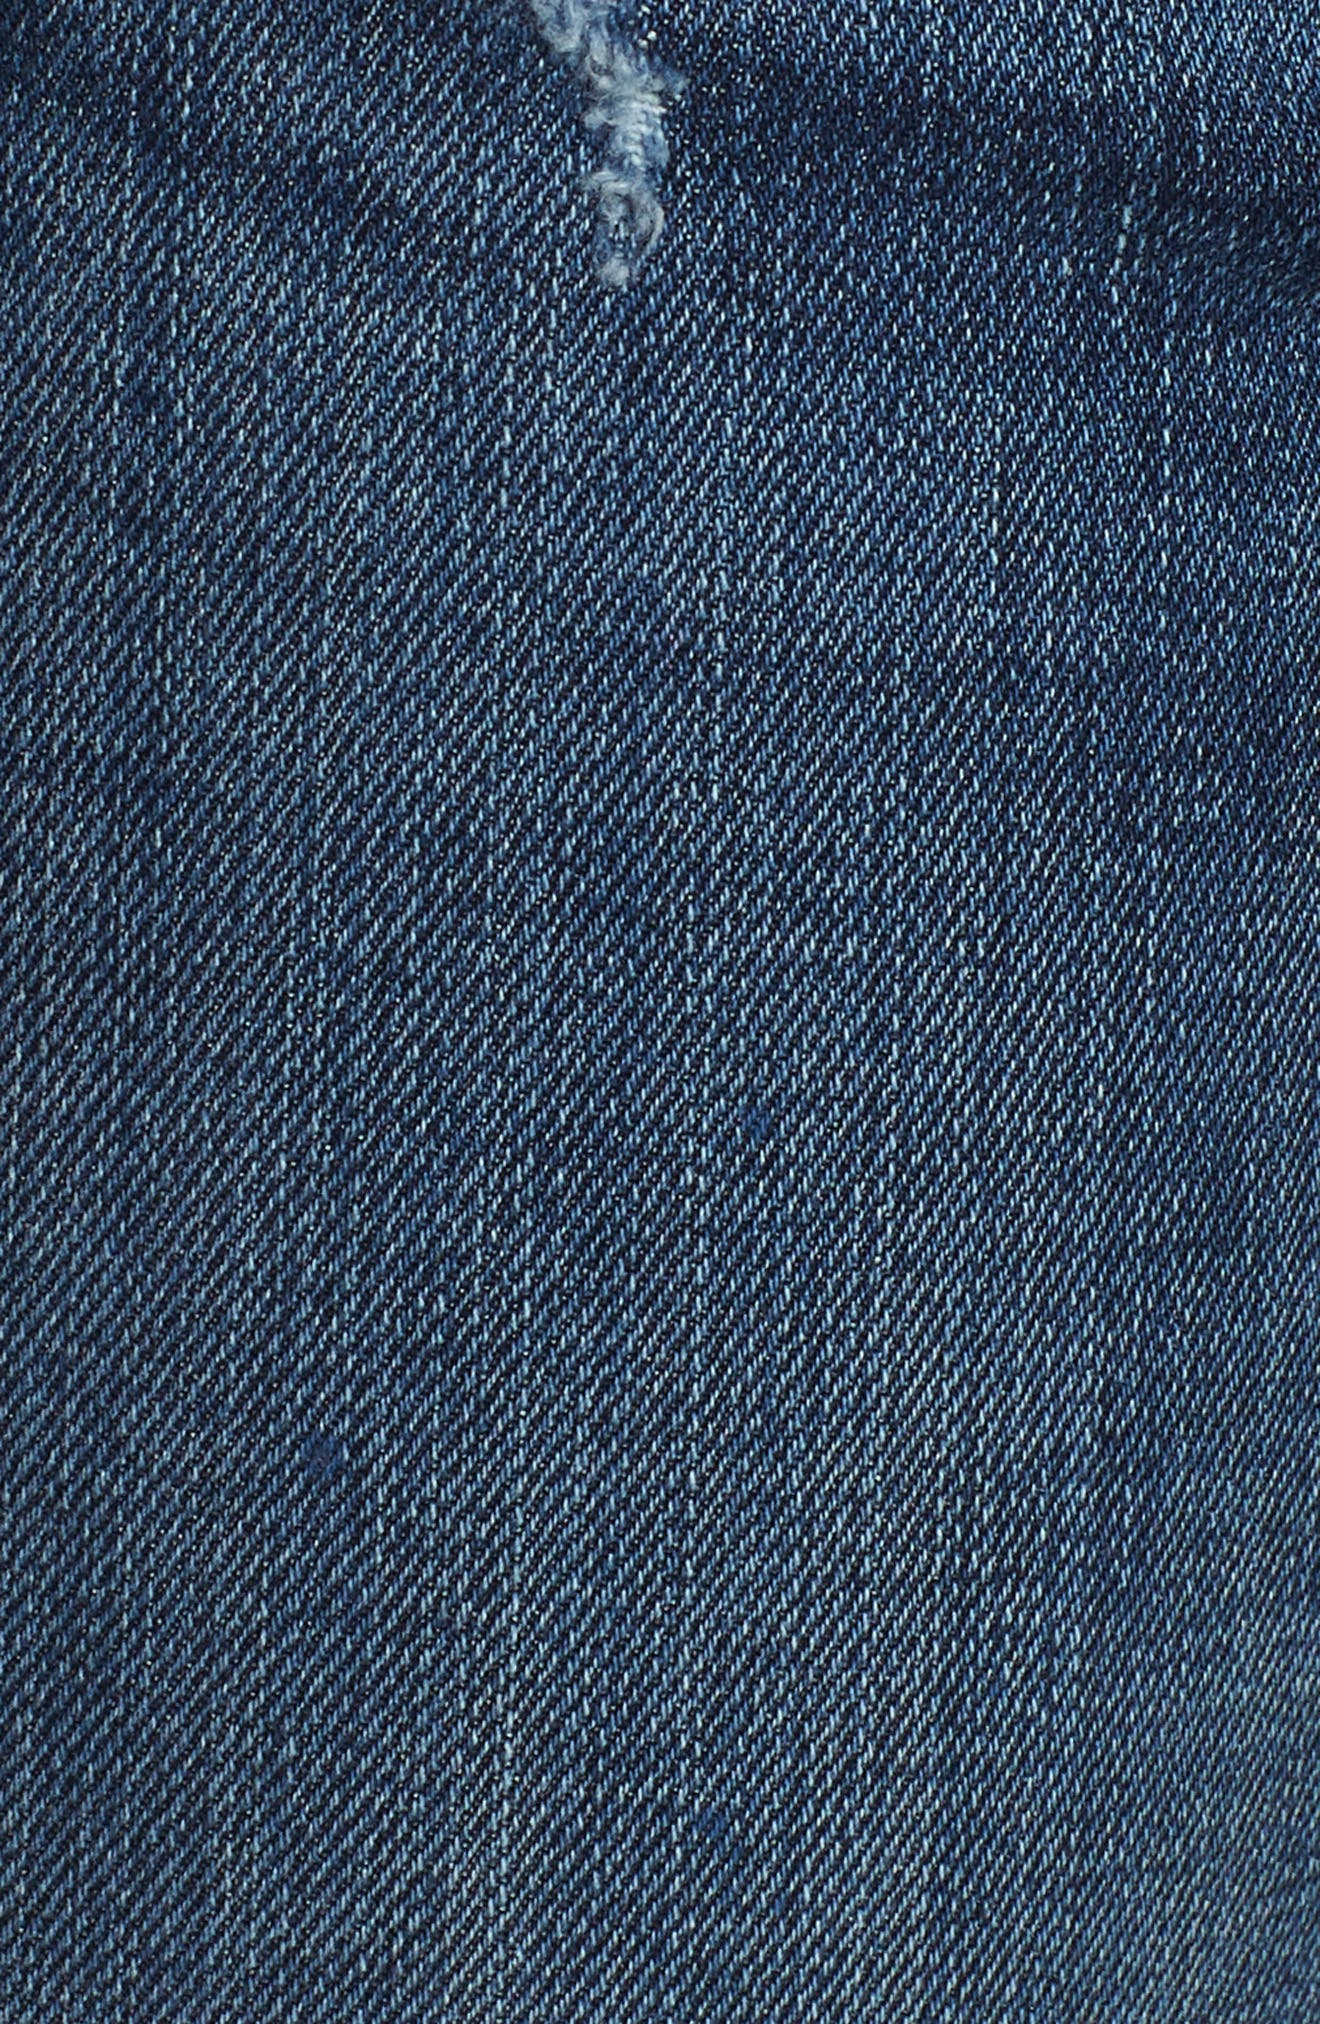 Barbara Exposed Zip High Waist Ankle Skinny Jeans,                             Alternate thumbnail 6, color,                             Vibez